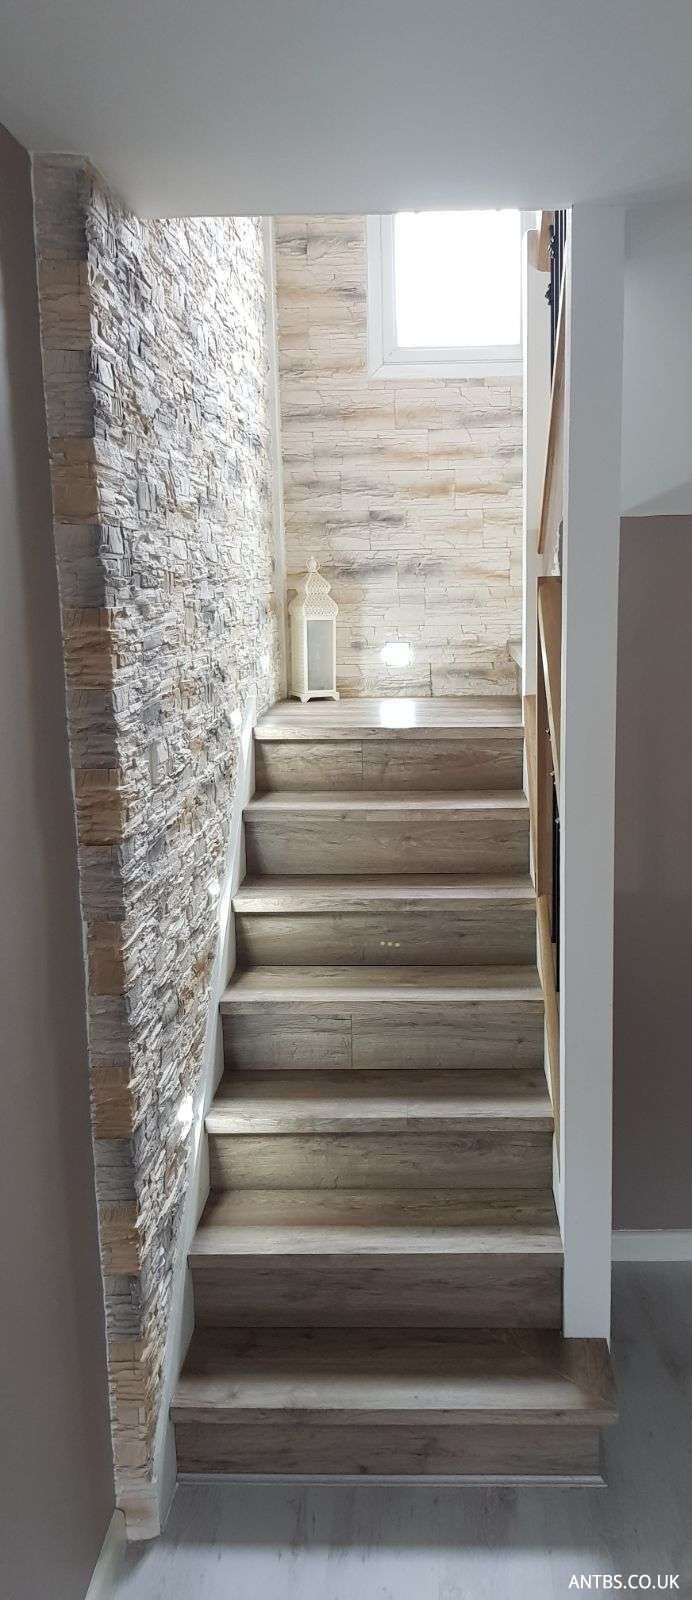 Mamperlan Bullnose Laminated Stair Panels In 2020 Stair Paneling Laminate Flooring On Stairs Laminate Stairs